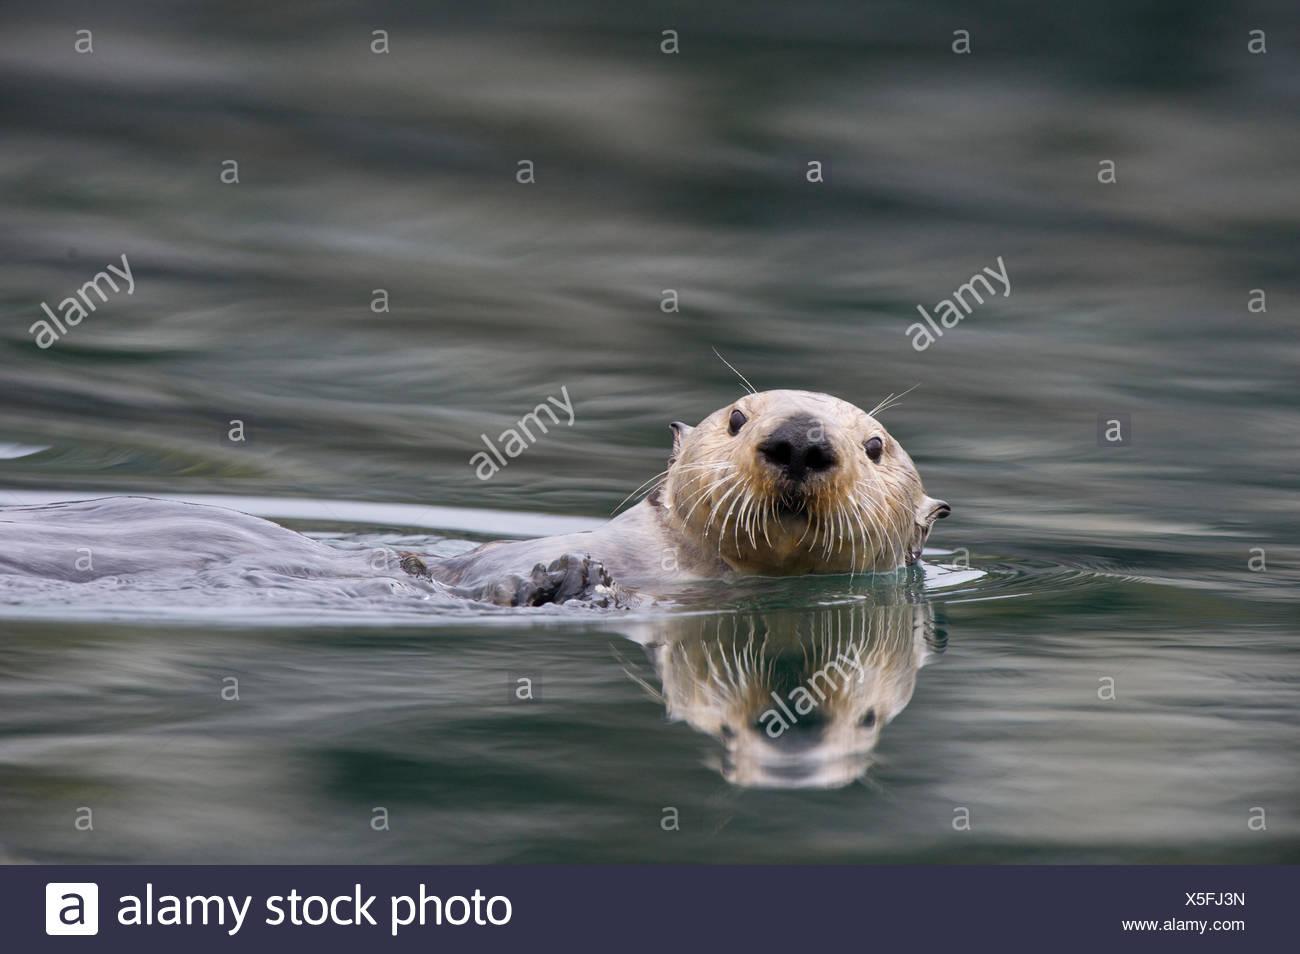 A sea otter swims in Alaskan waters. - Stock Image